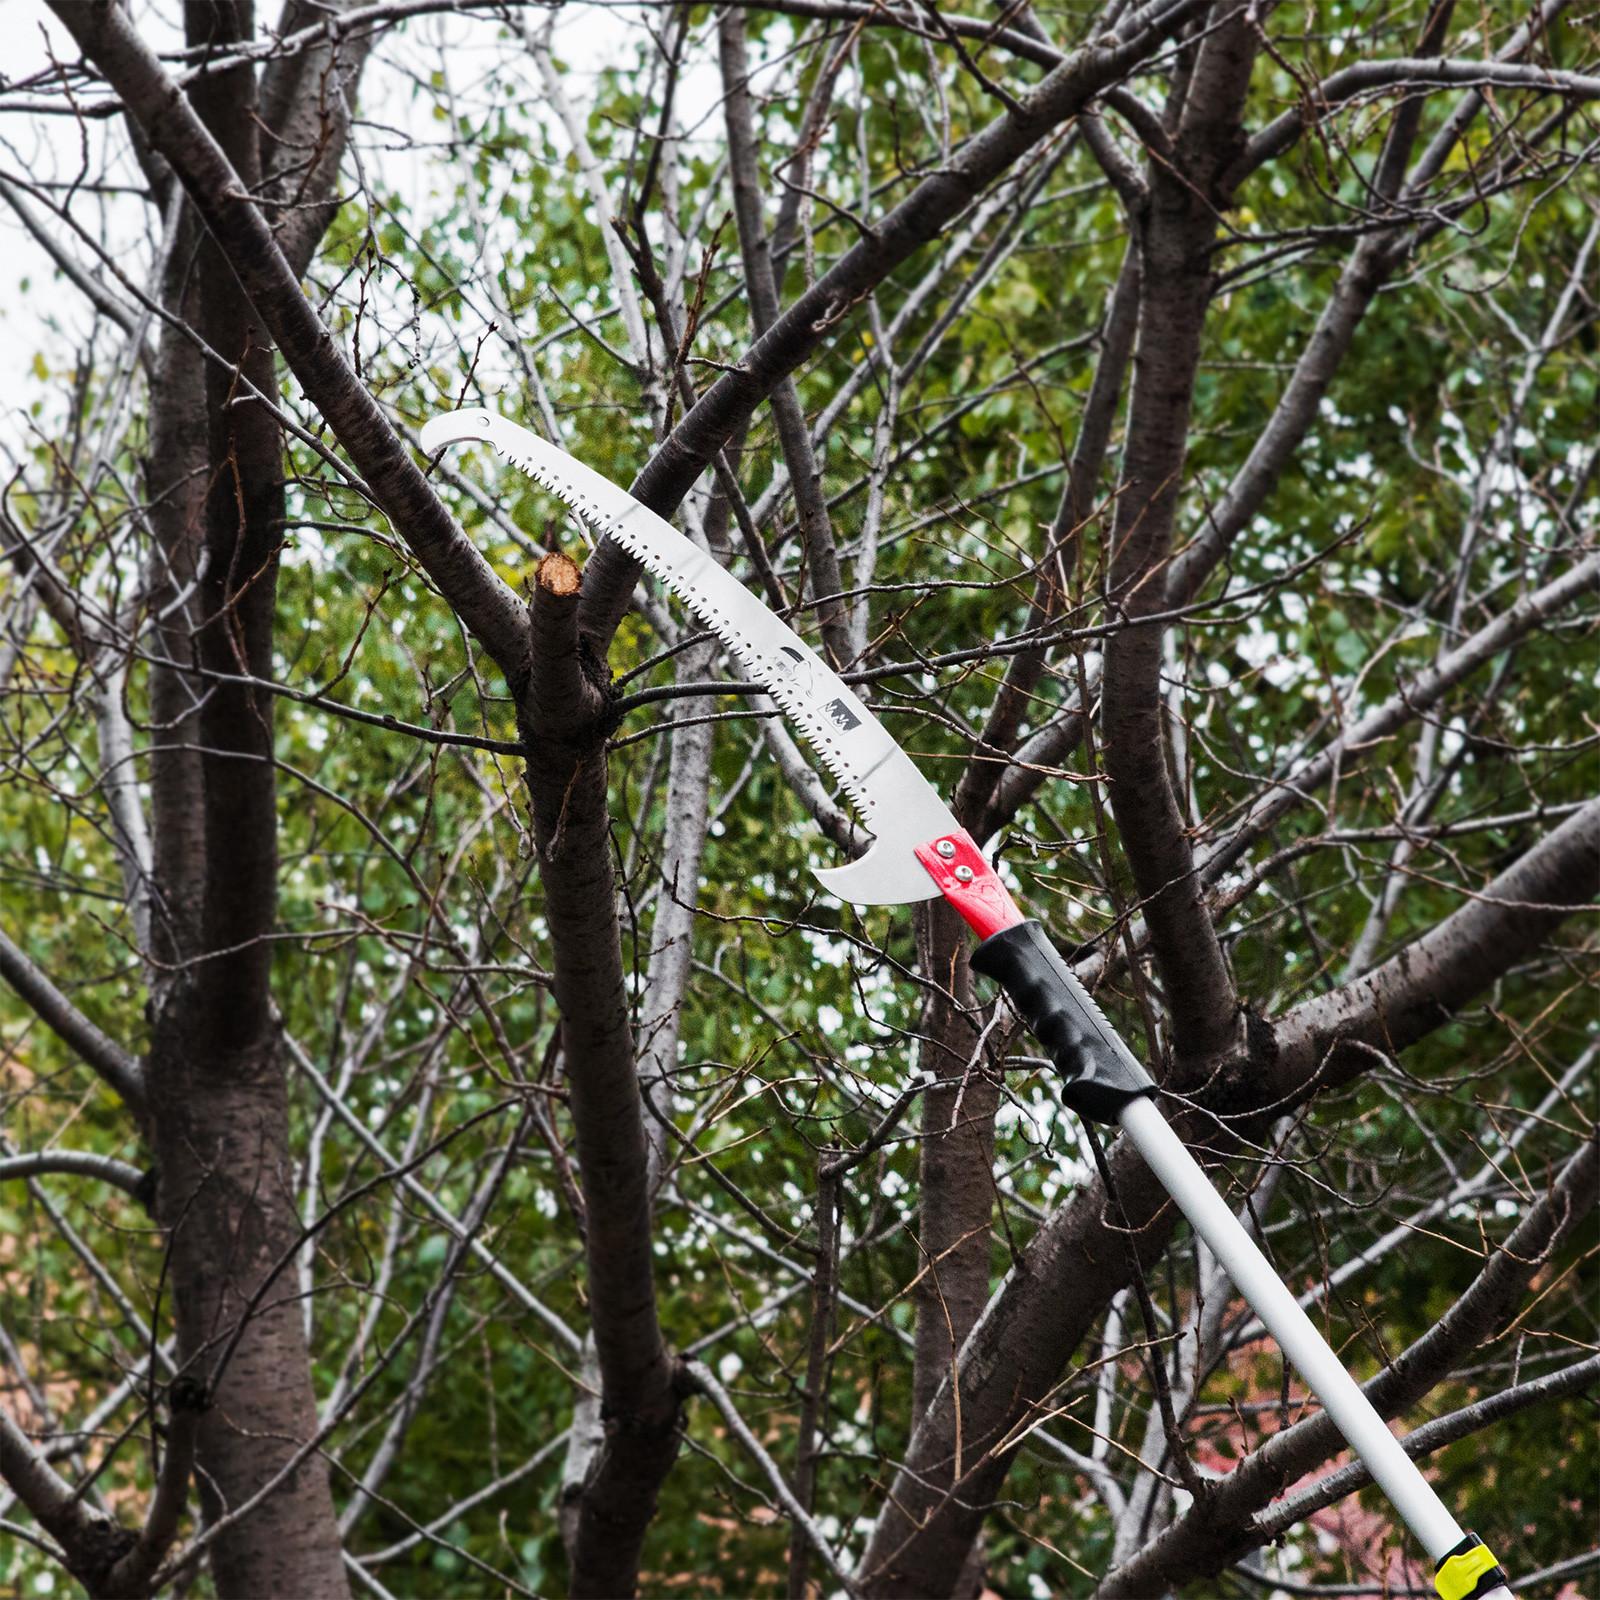 Telescopic-Pole-Pruner-Saw-Pruning-1-2-3-6m-1-8-5-4m-1-8-7-2m-w-59cm-Blade thumbnail 47